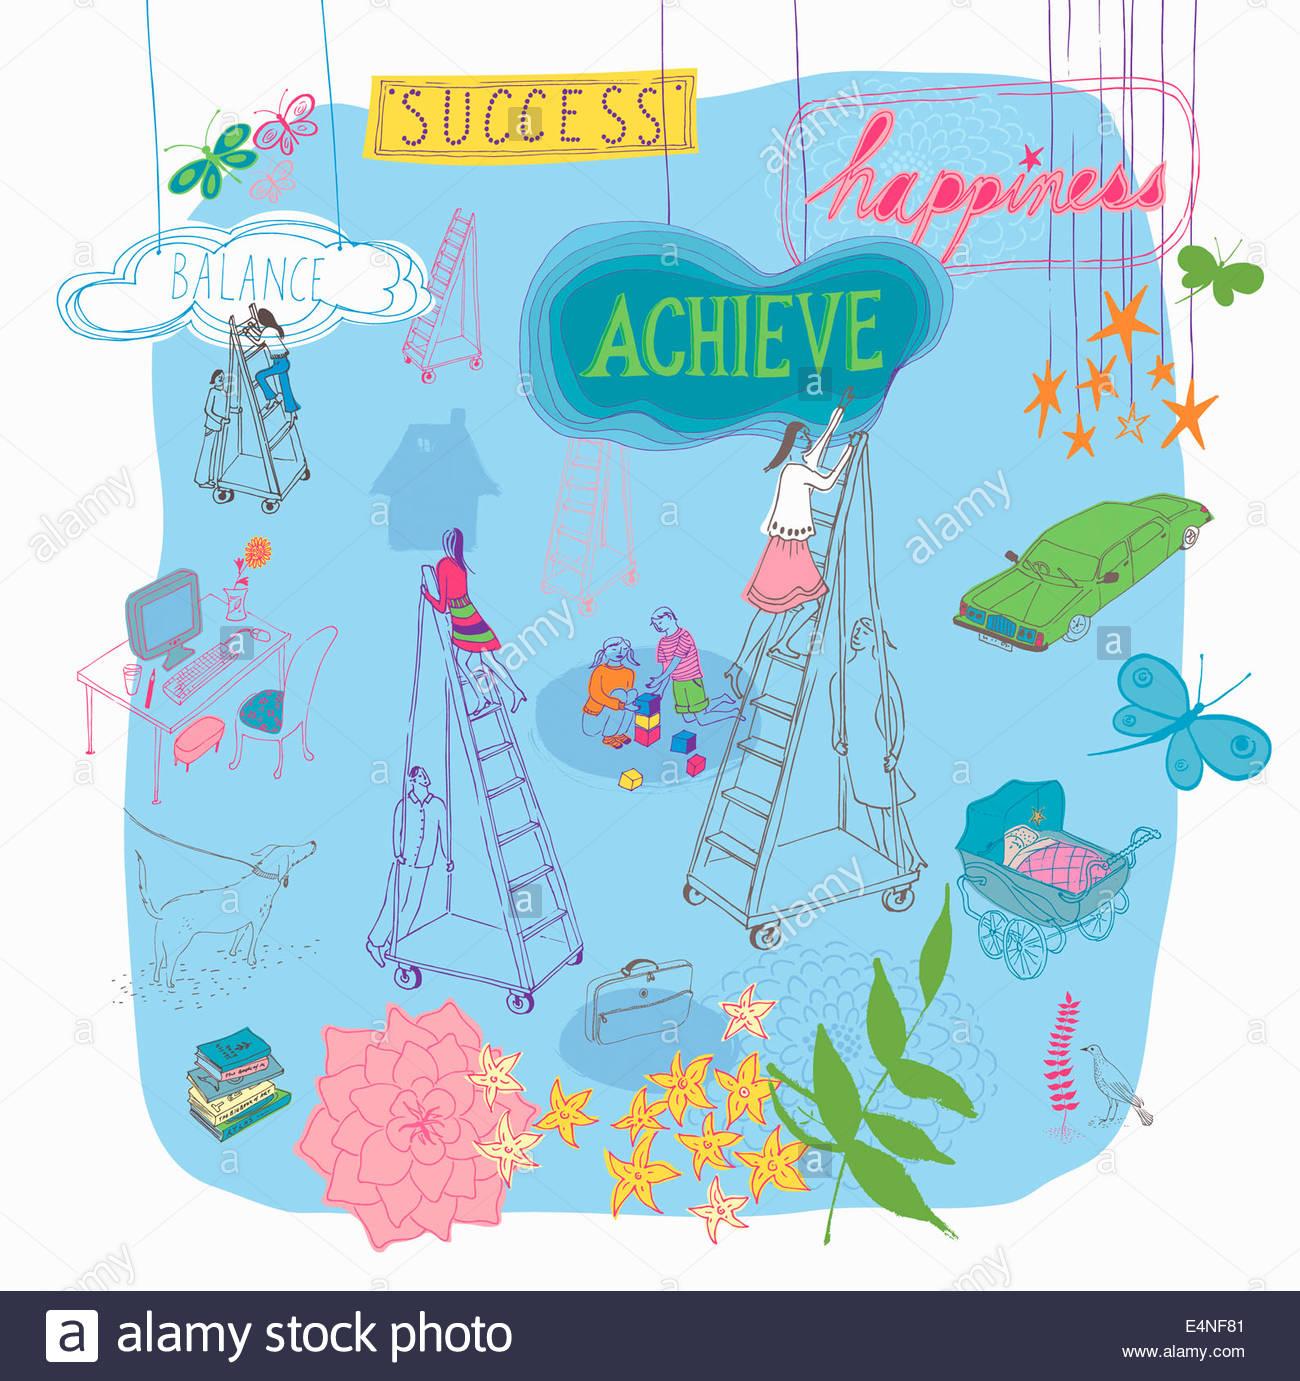 Multitasking women climbing ladders to future success balancing family and work life - Stock Image